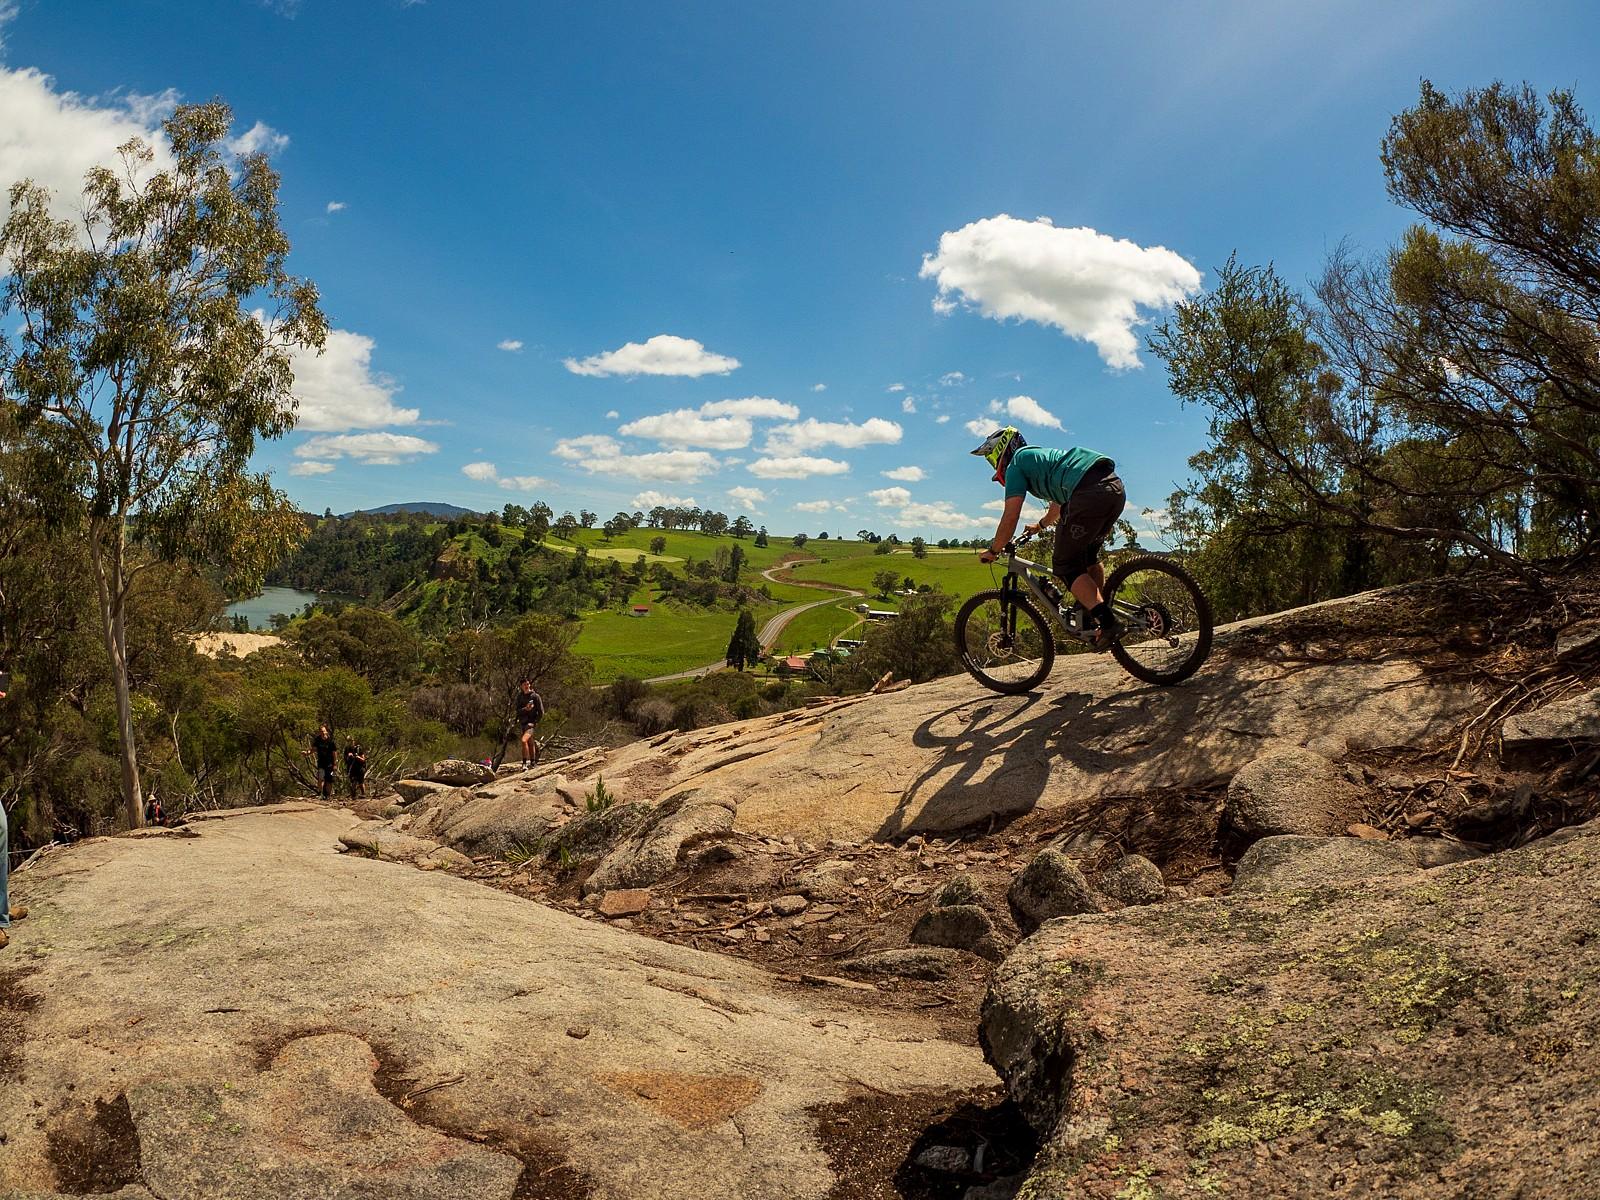 171119-Tassie-0050 - jack.fletcher86 - Mountain Biking Pictures - Vital MTB